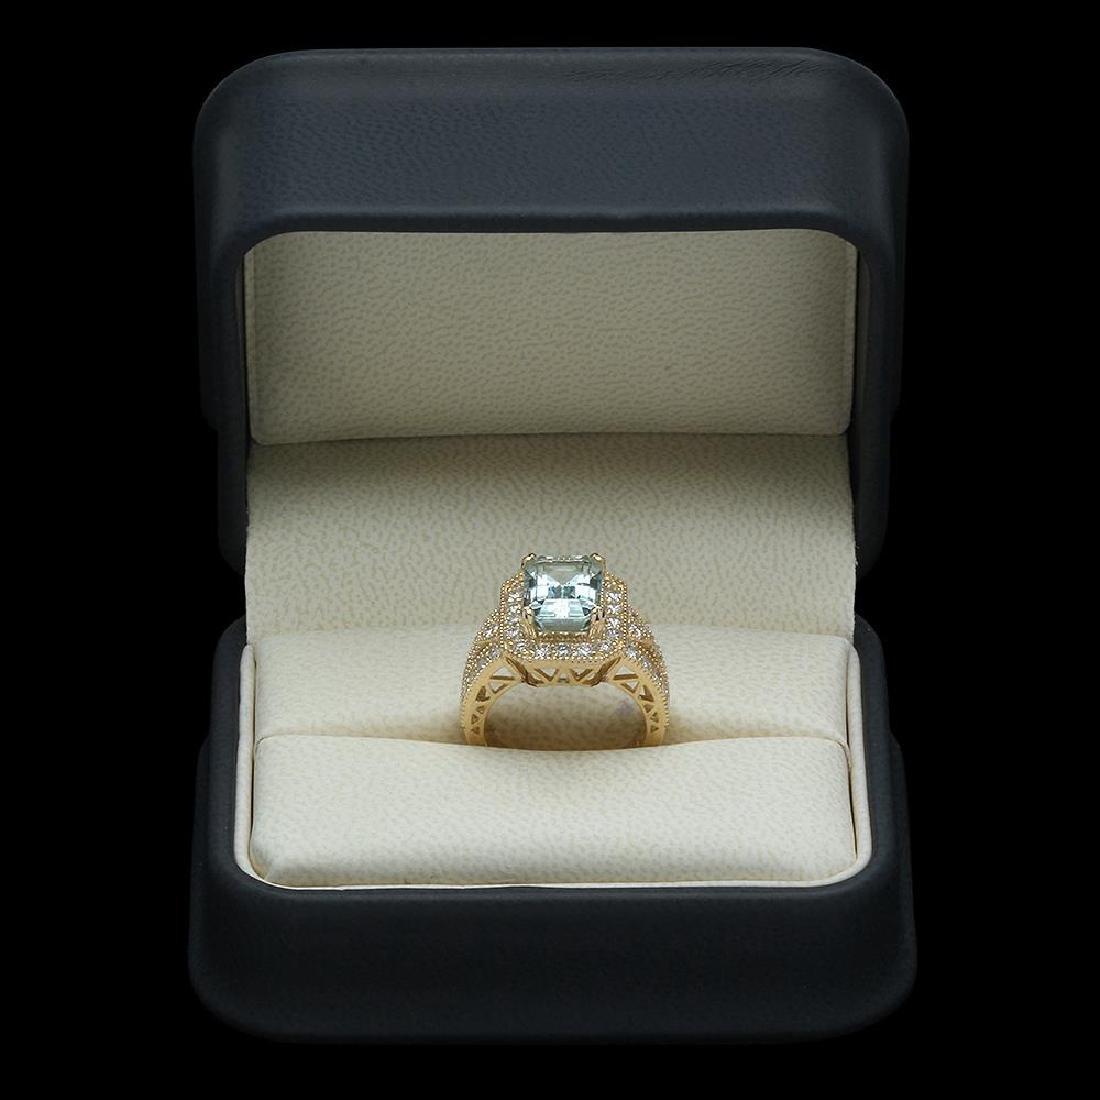 14K Gold 3.85ct Aquamarine & 1.46ct Diamond Ring - 4